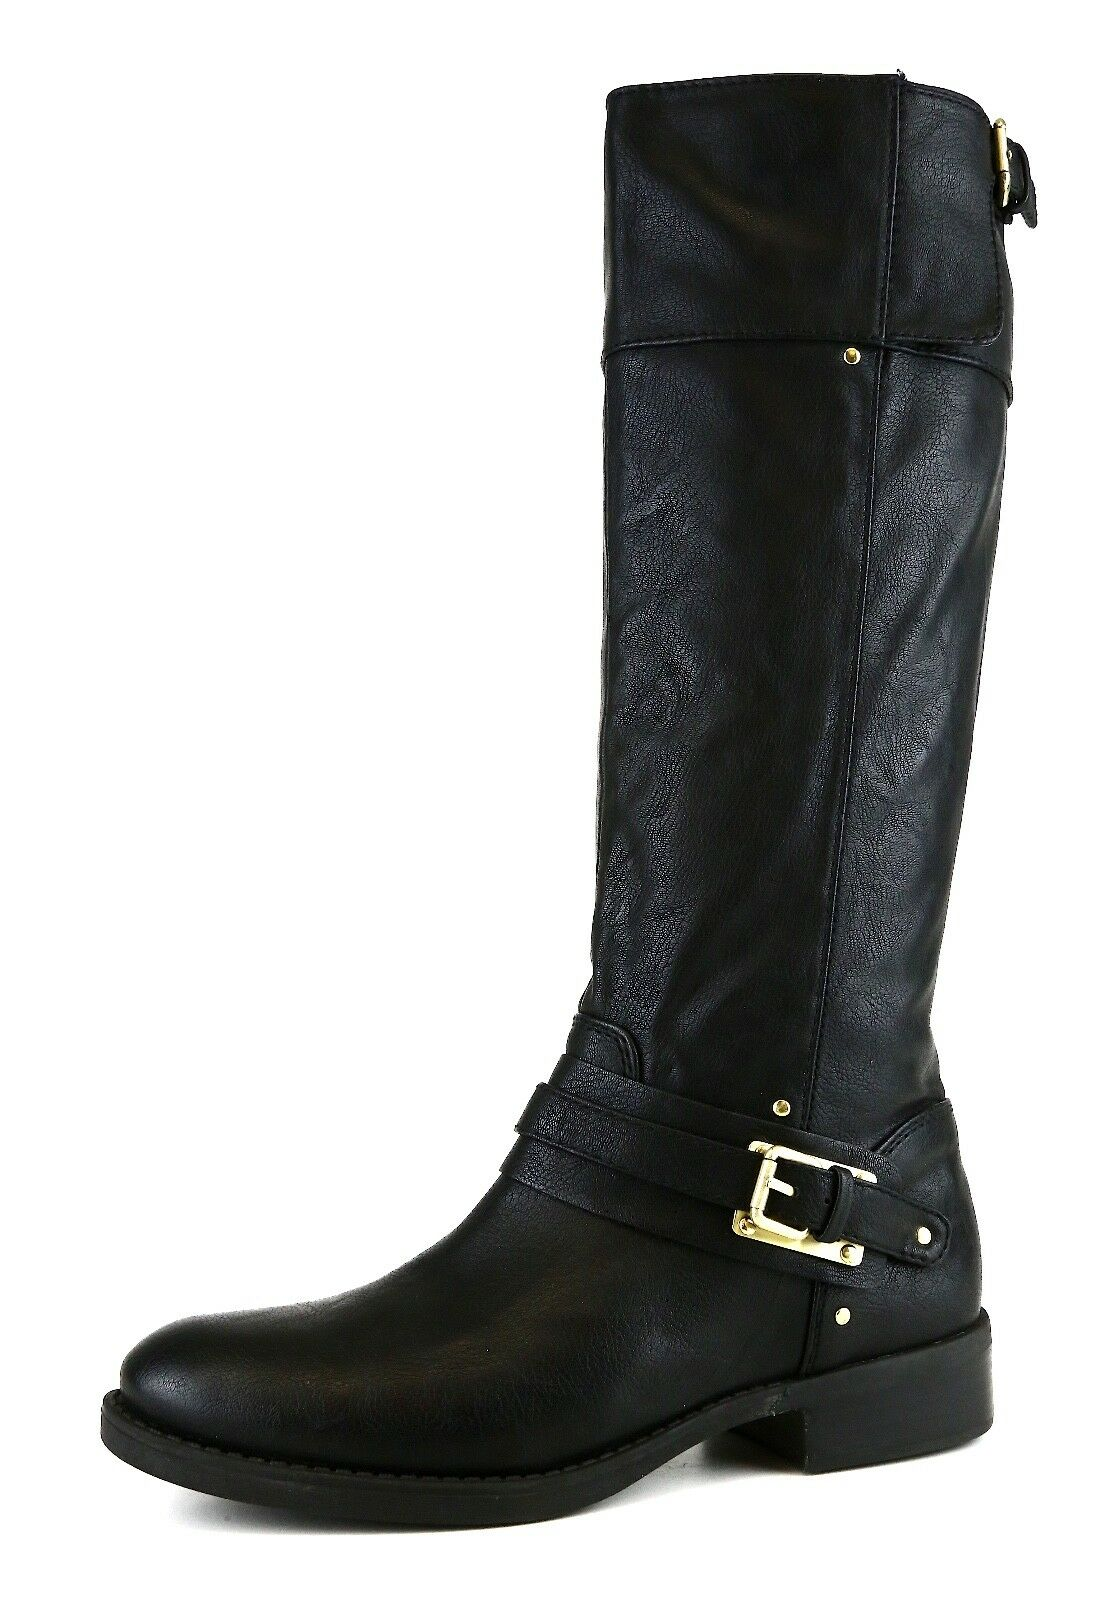 Dolce Vita Side Buckle Leather Knee High Boot Black Women Sz 7.5 5555 *